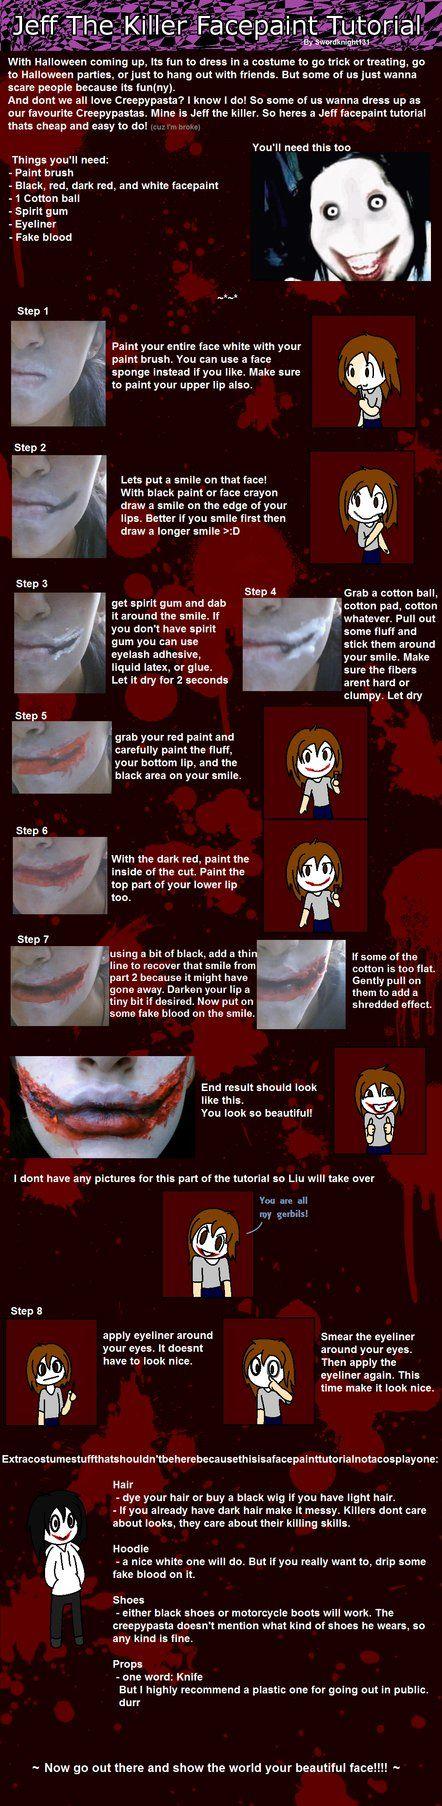 Jeff The Killer Makeup Tutorial jeff the killer cosplay tips. good ...